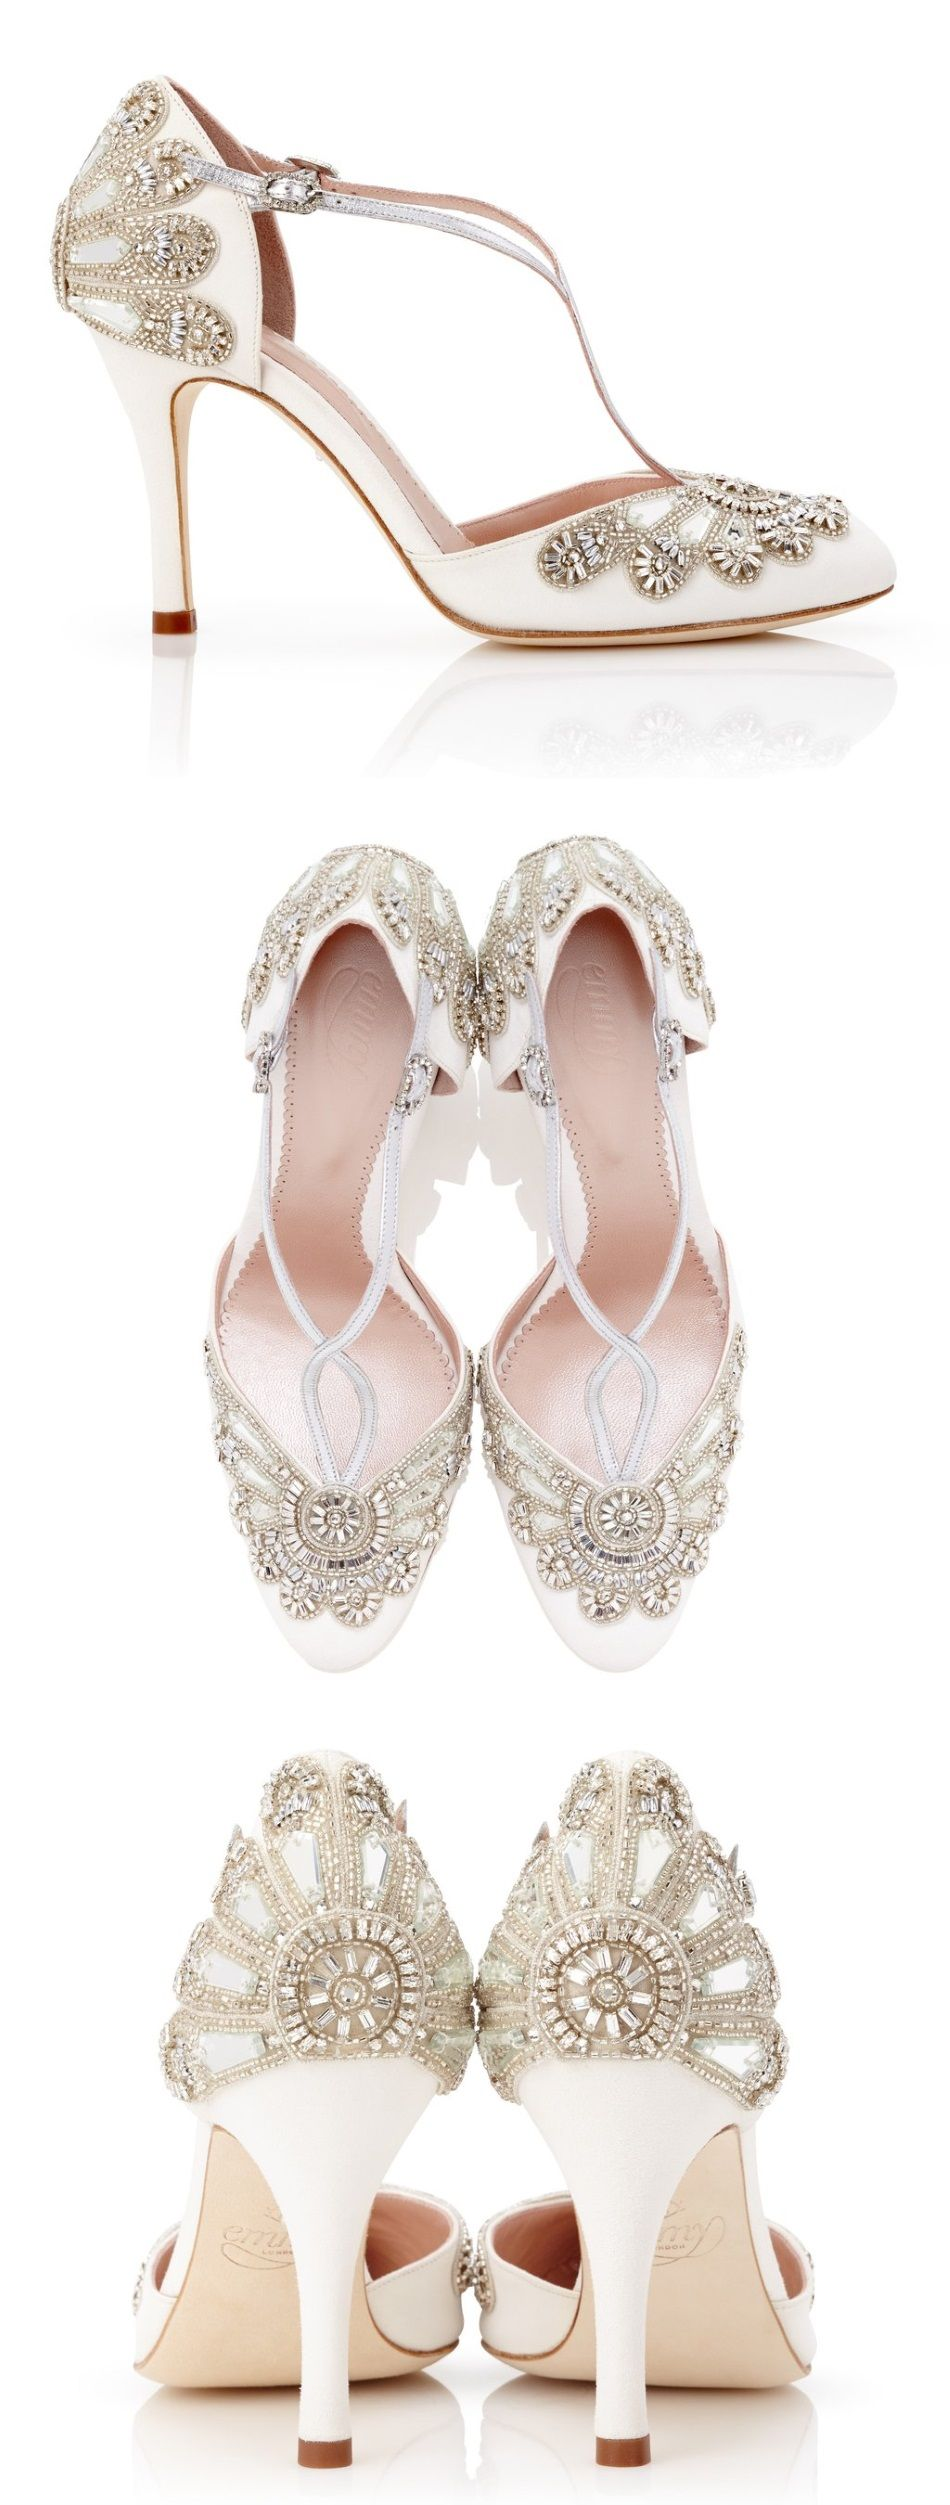 Cecile Ivory Satin Wedding Shoes Bridal Shoes Bridal Shoes Vintage